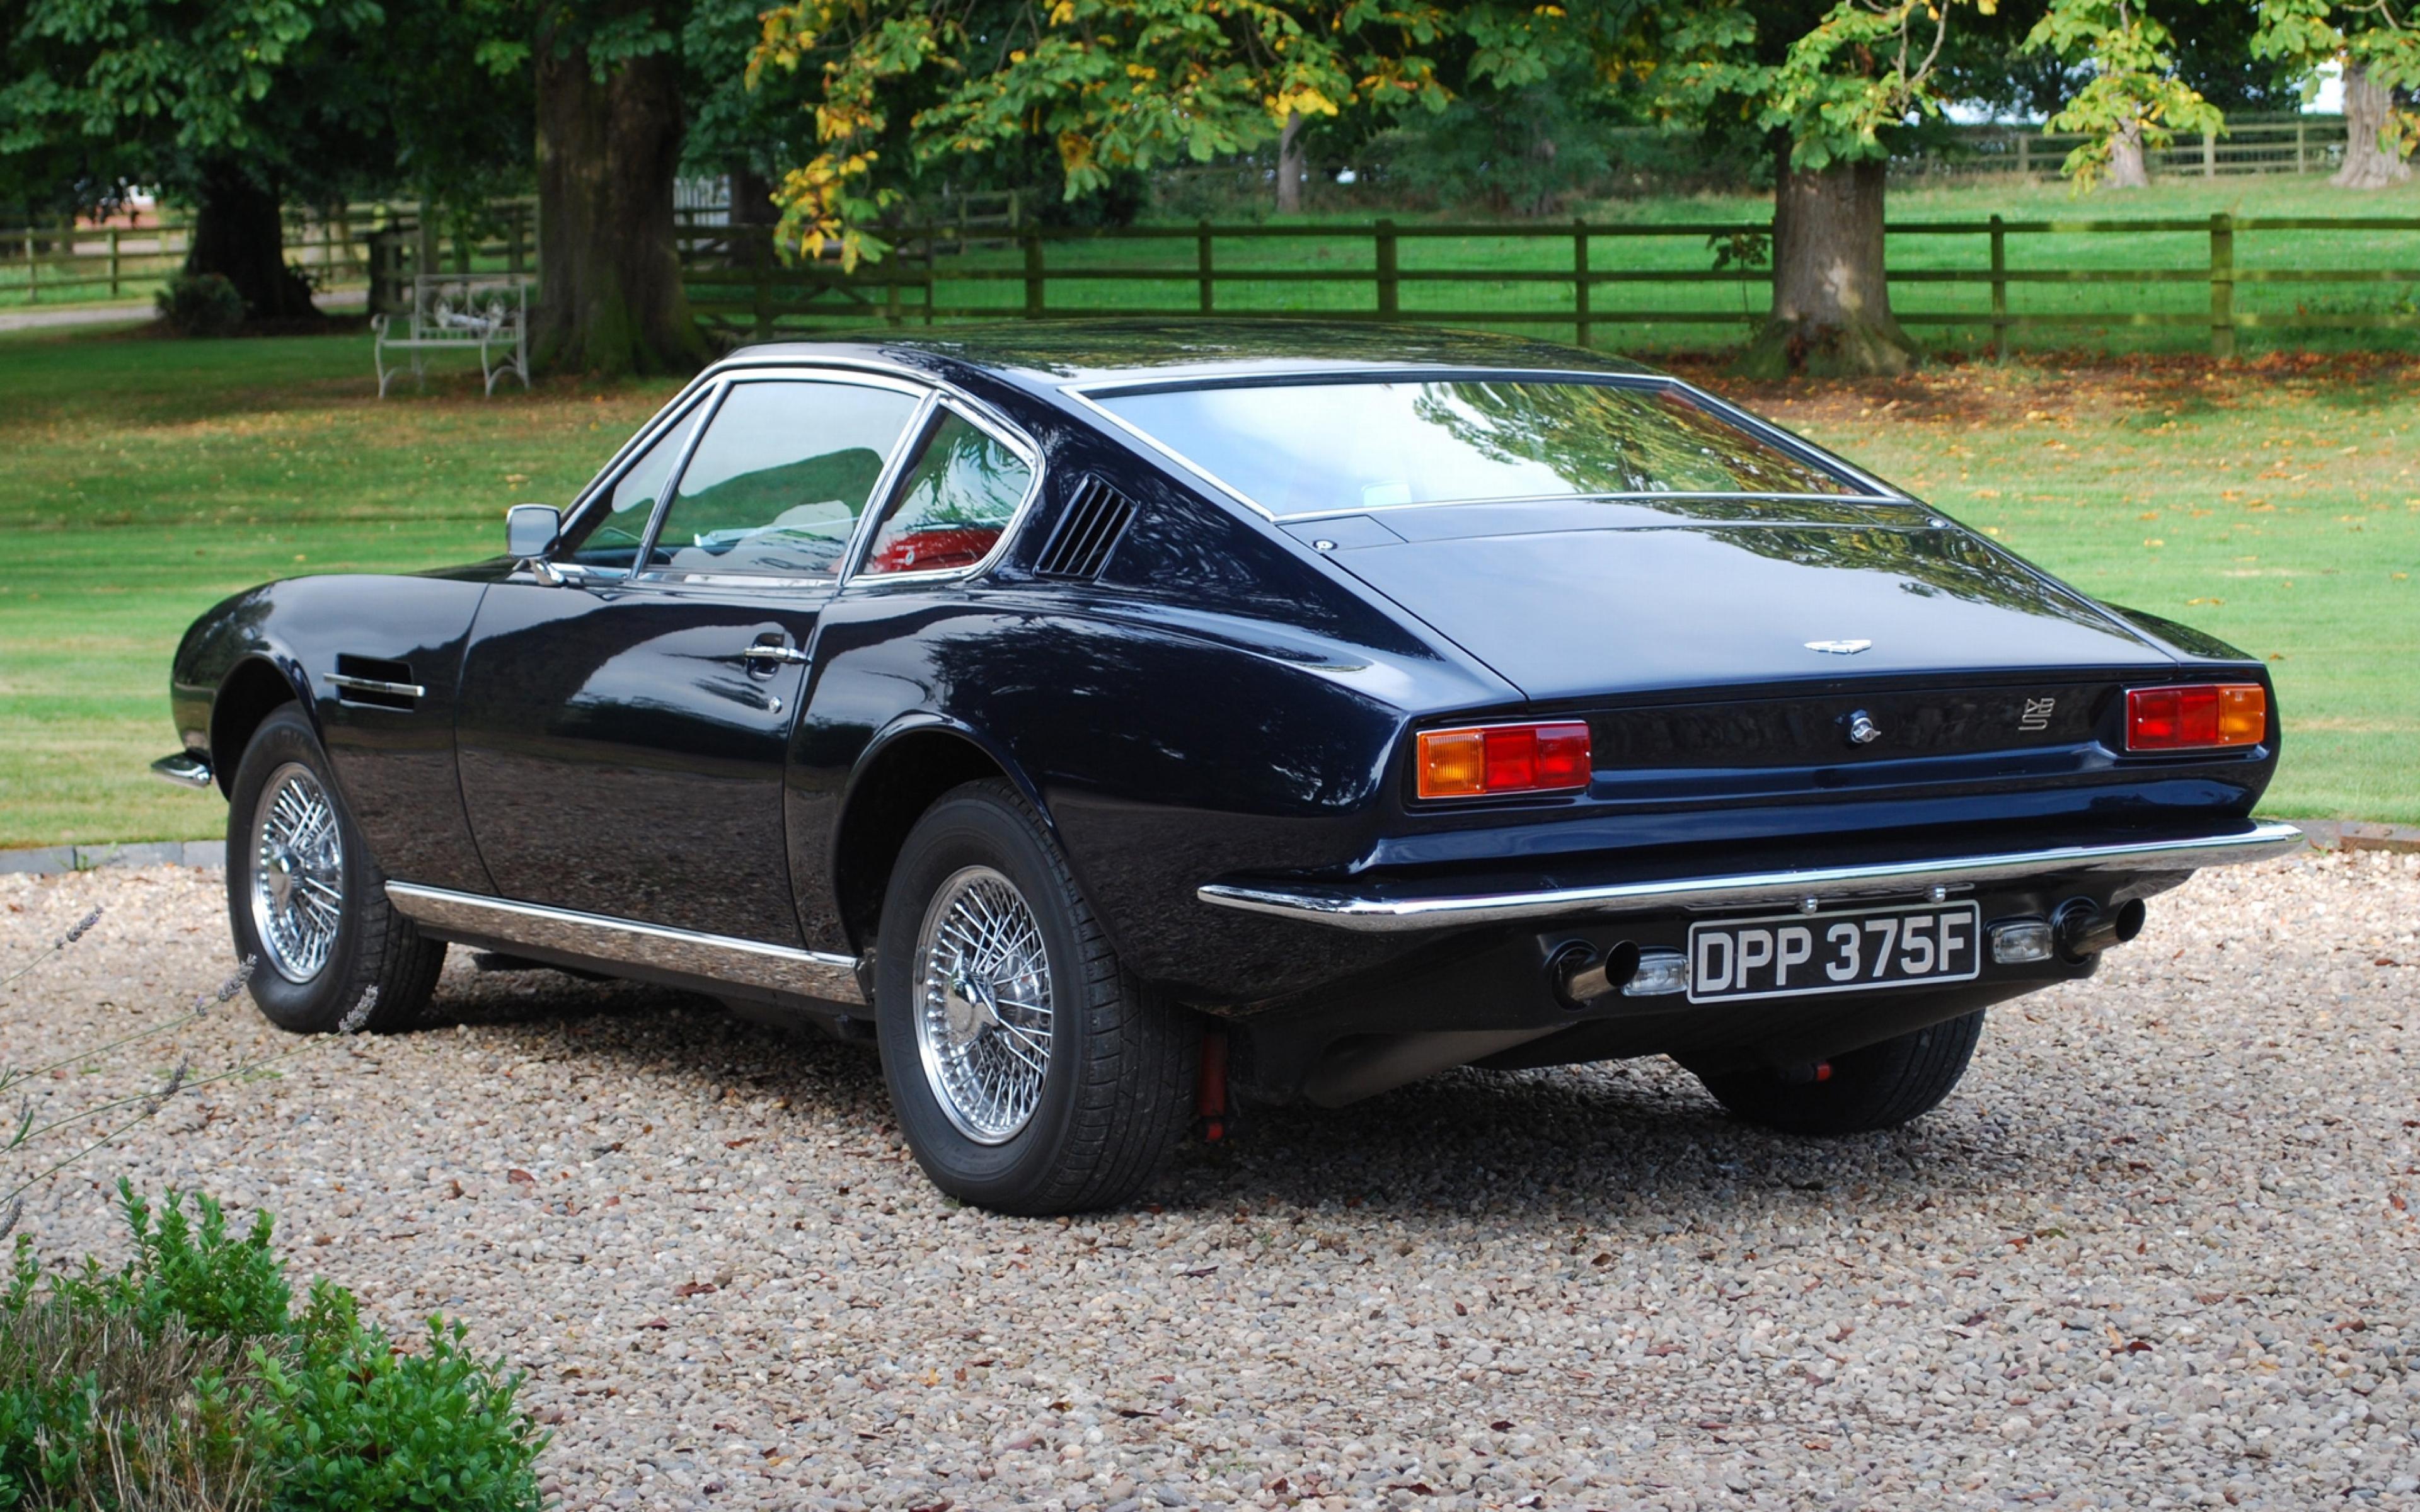 Download Wallpaper 3840x2400 Aston martin Dbs 1967 Blue Rear view 3840x2400